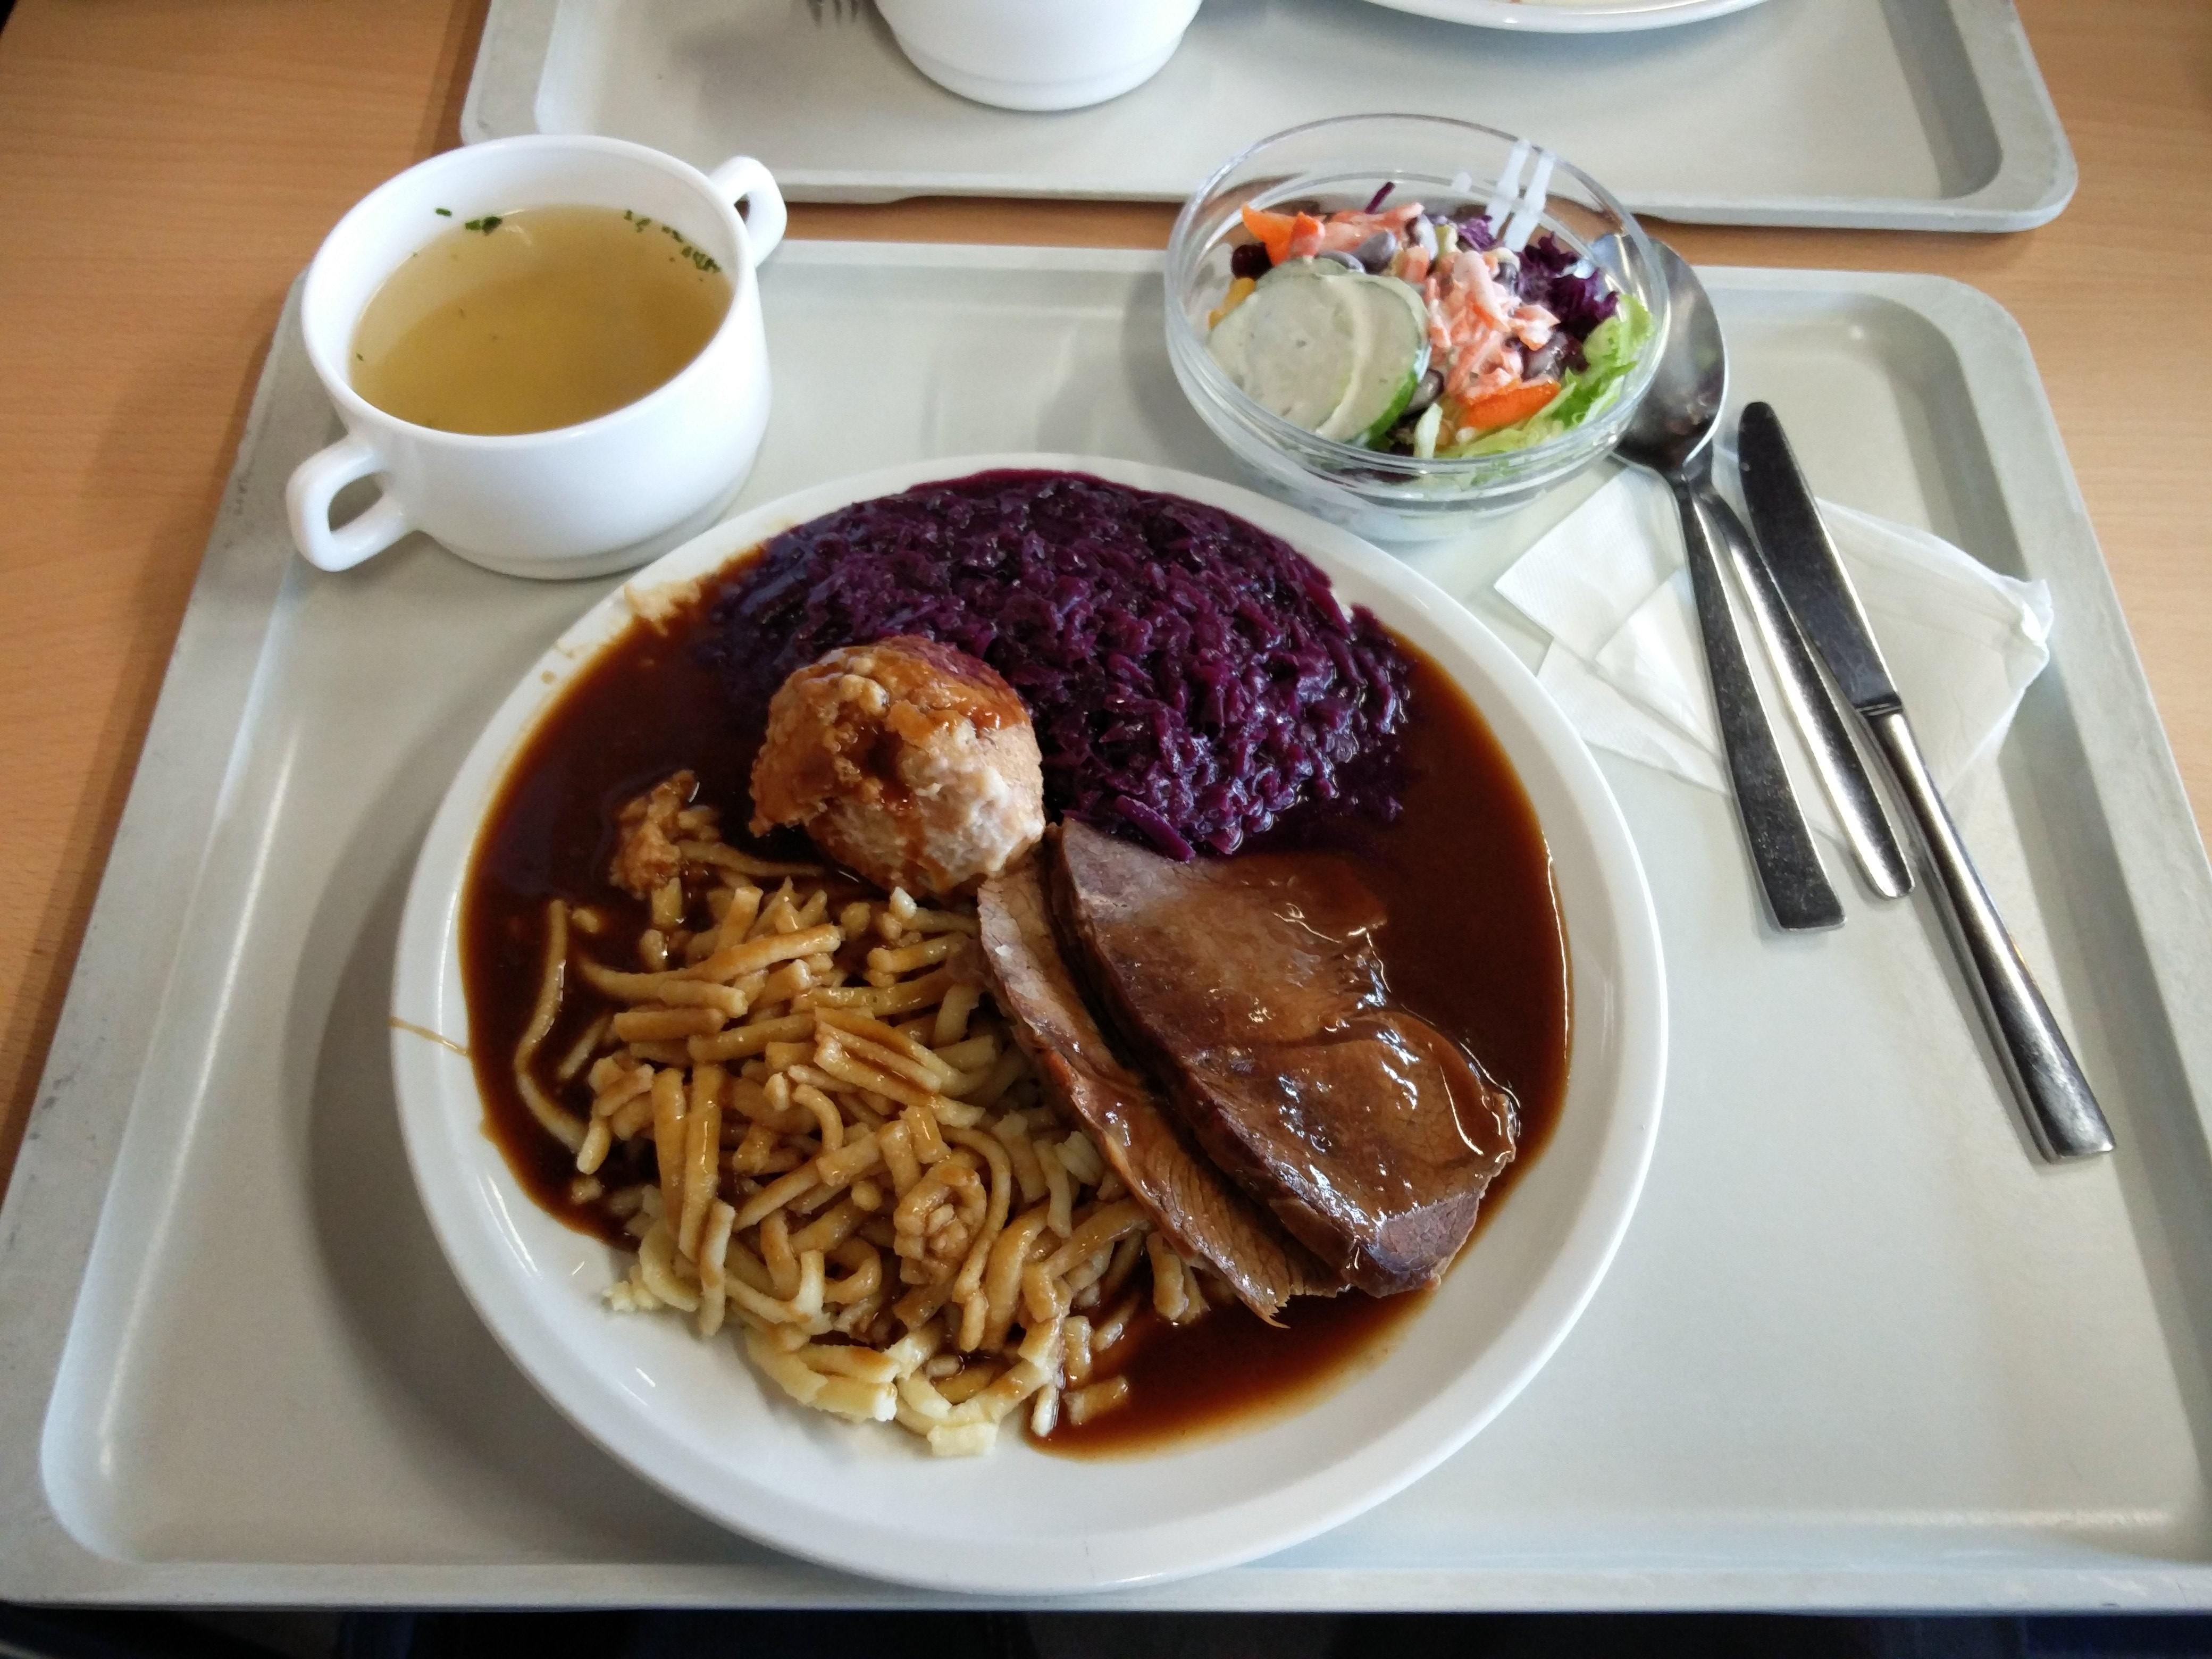 http://foodloader.net/nico_2016-11-16_sauerbraten-spaetzle-rotkraut-knoedel-suppe-salat.jpg